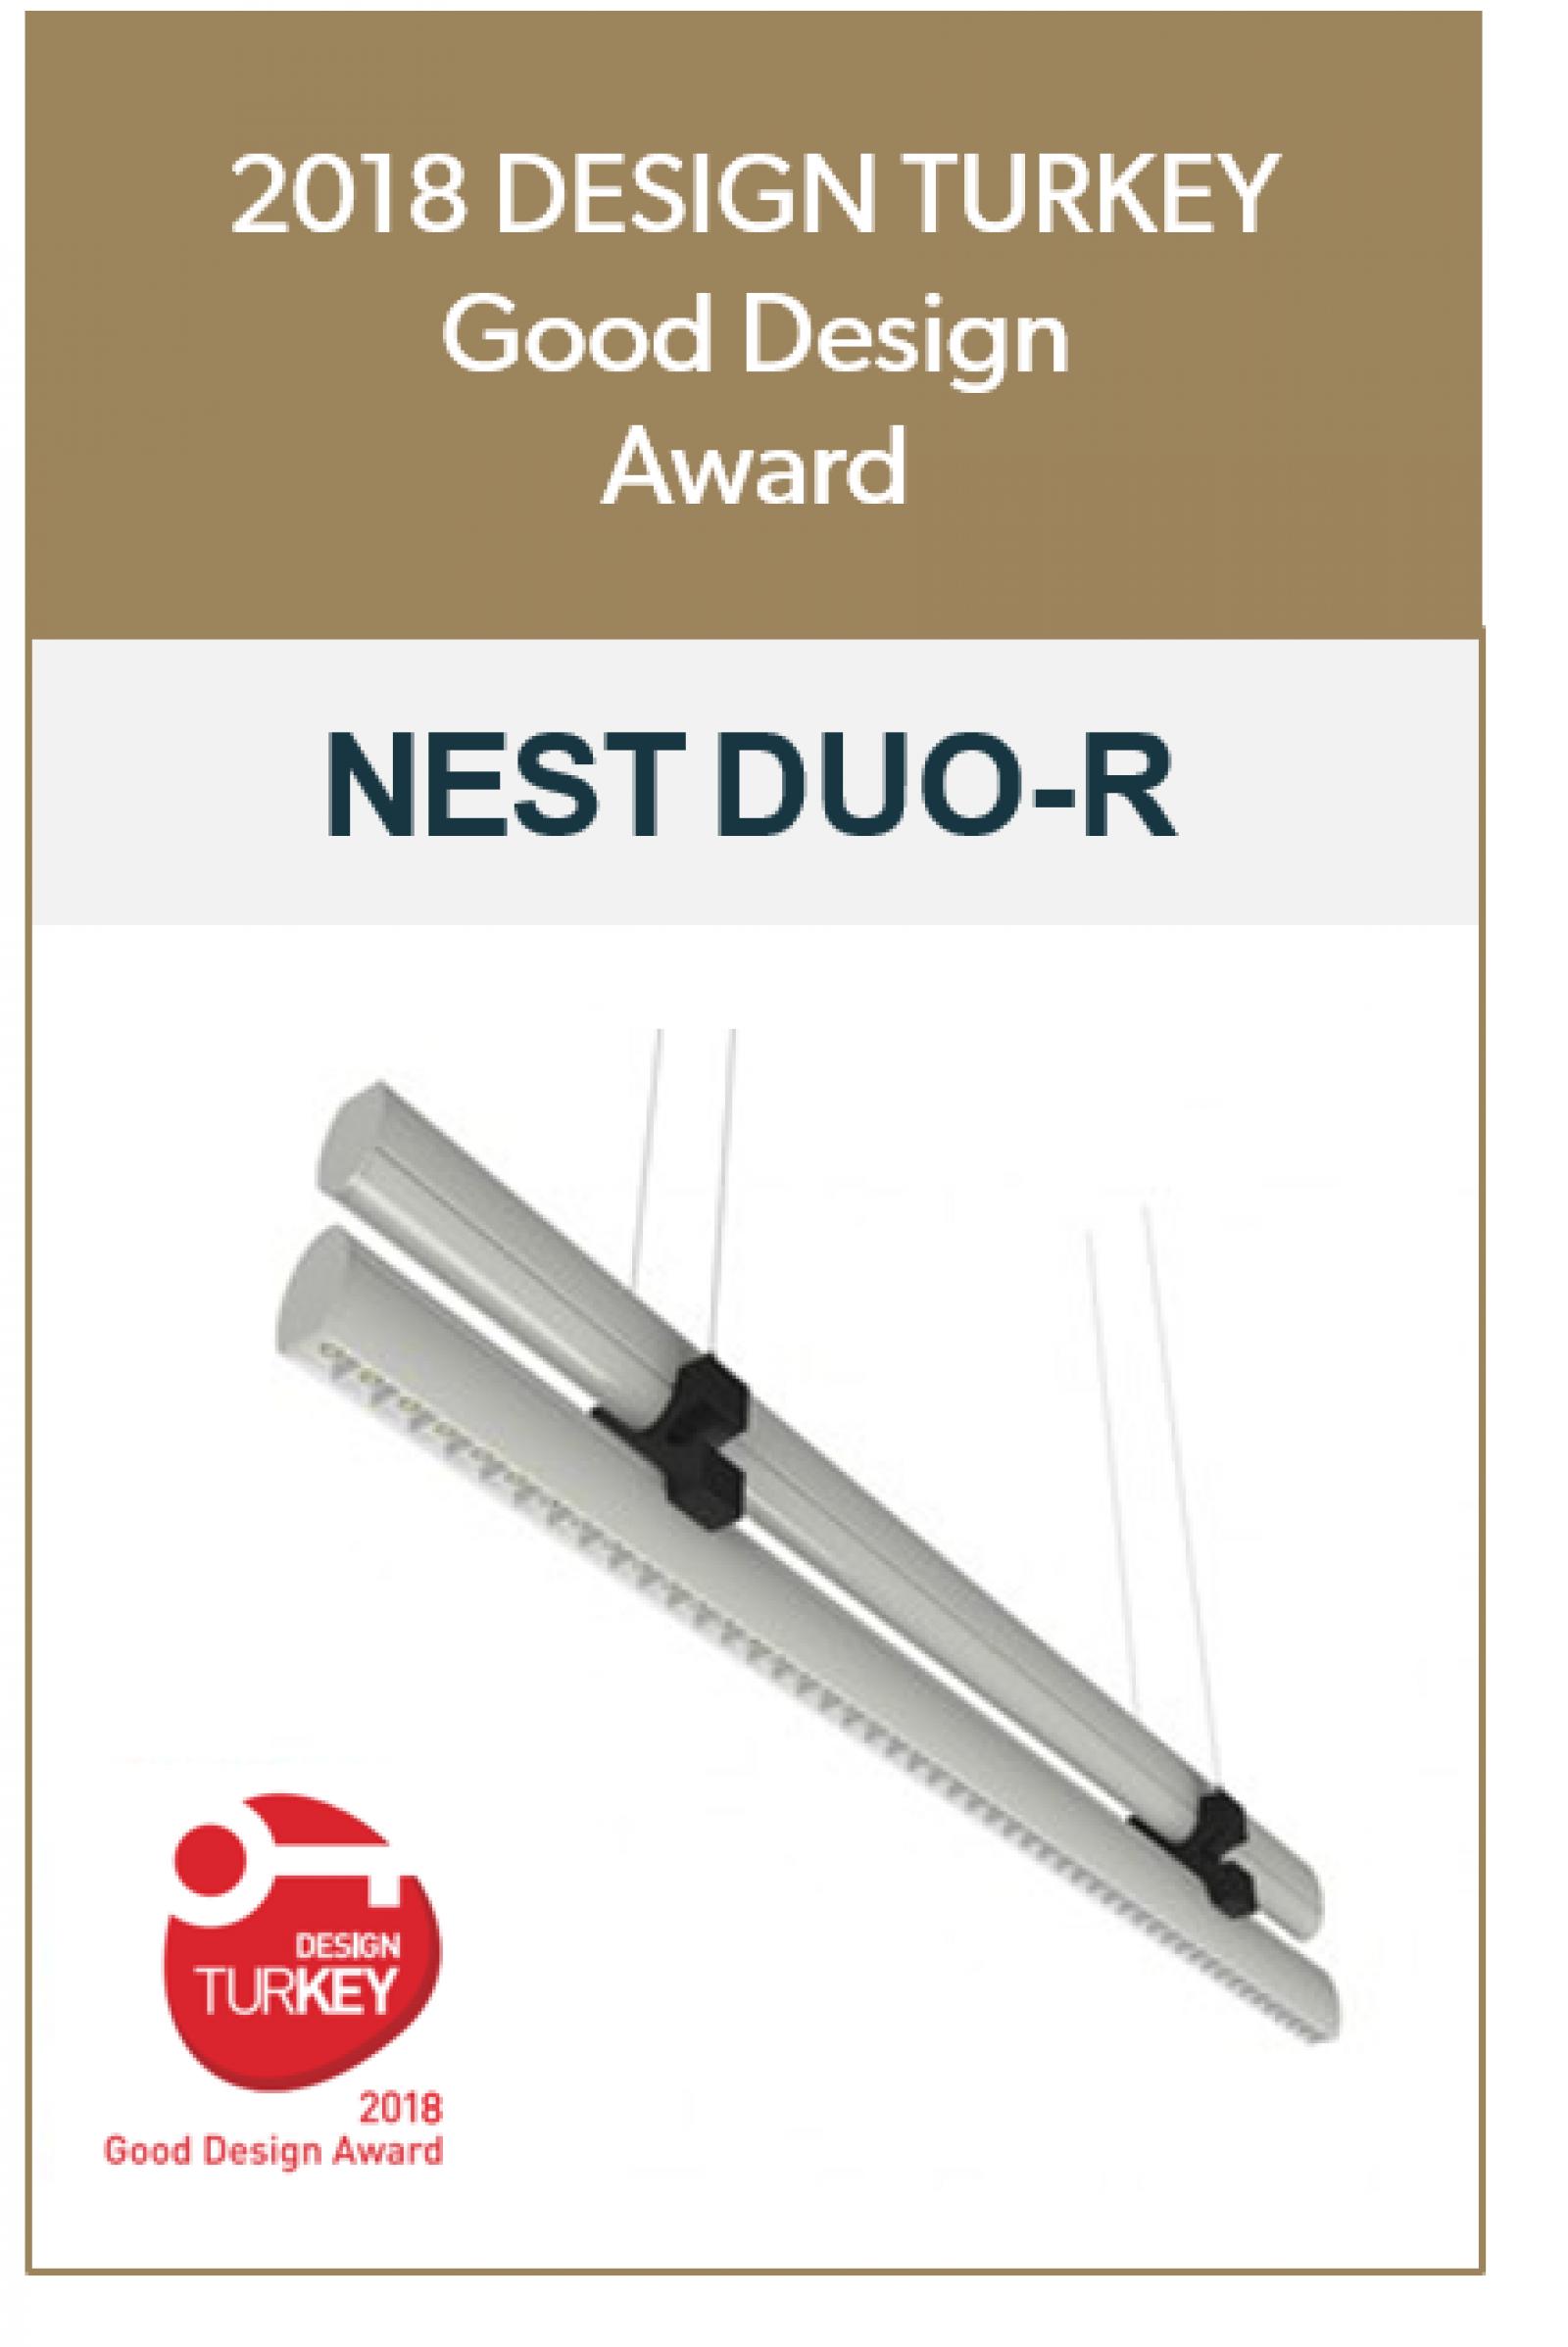 NEST DUO - R Good Design Award